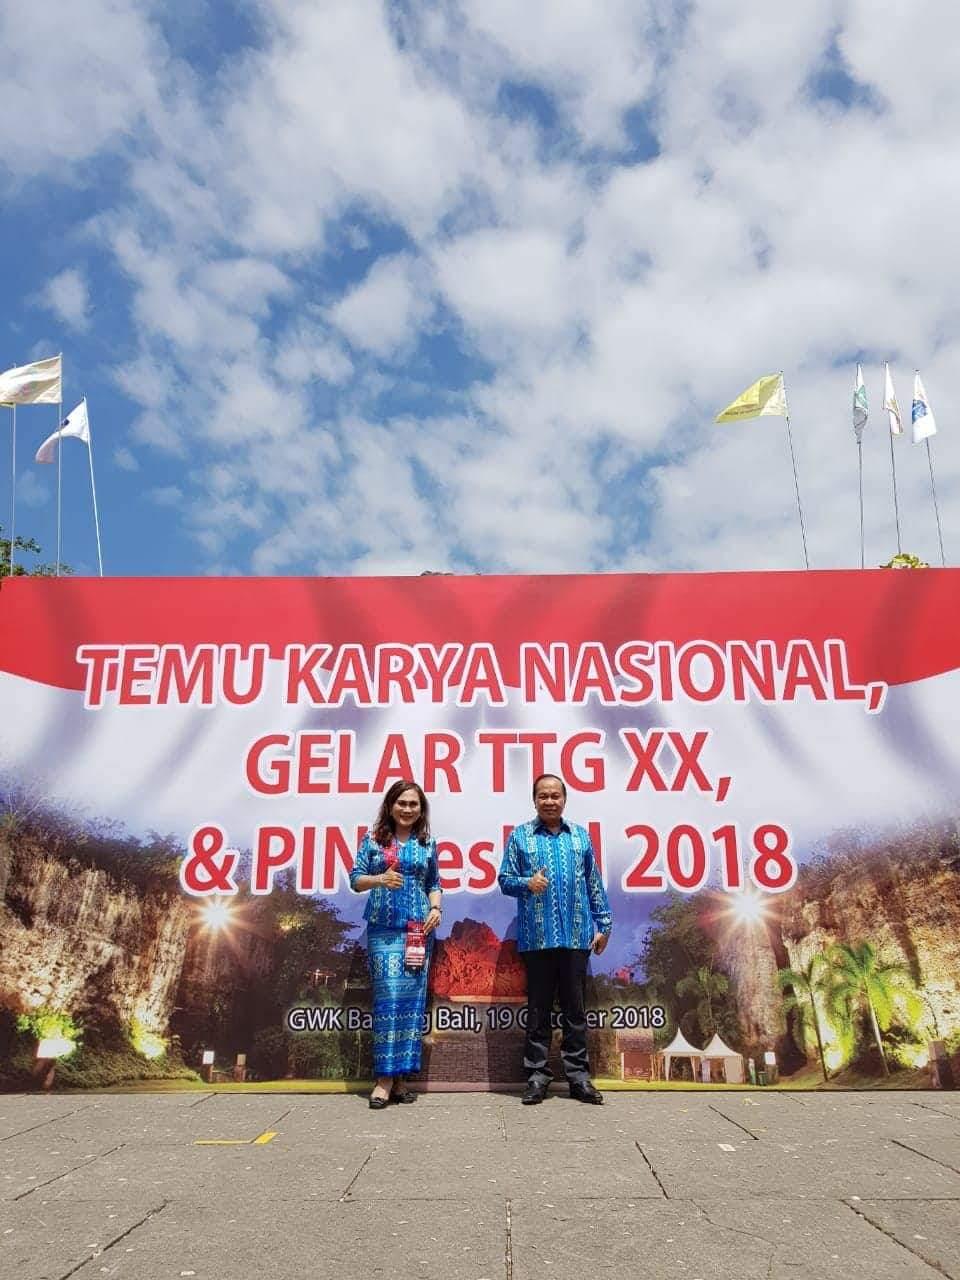 Dibuka Presiden, Lomban Hadiri TKN, PINDesKel dan Gelar Teknologi Tepat Guna XX 2018